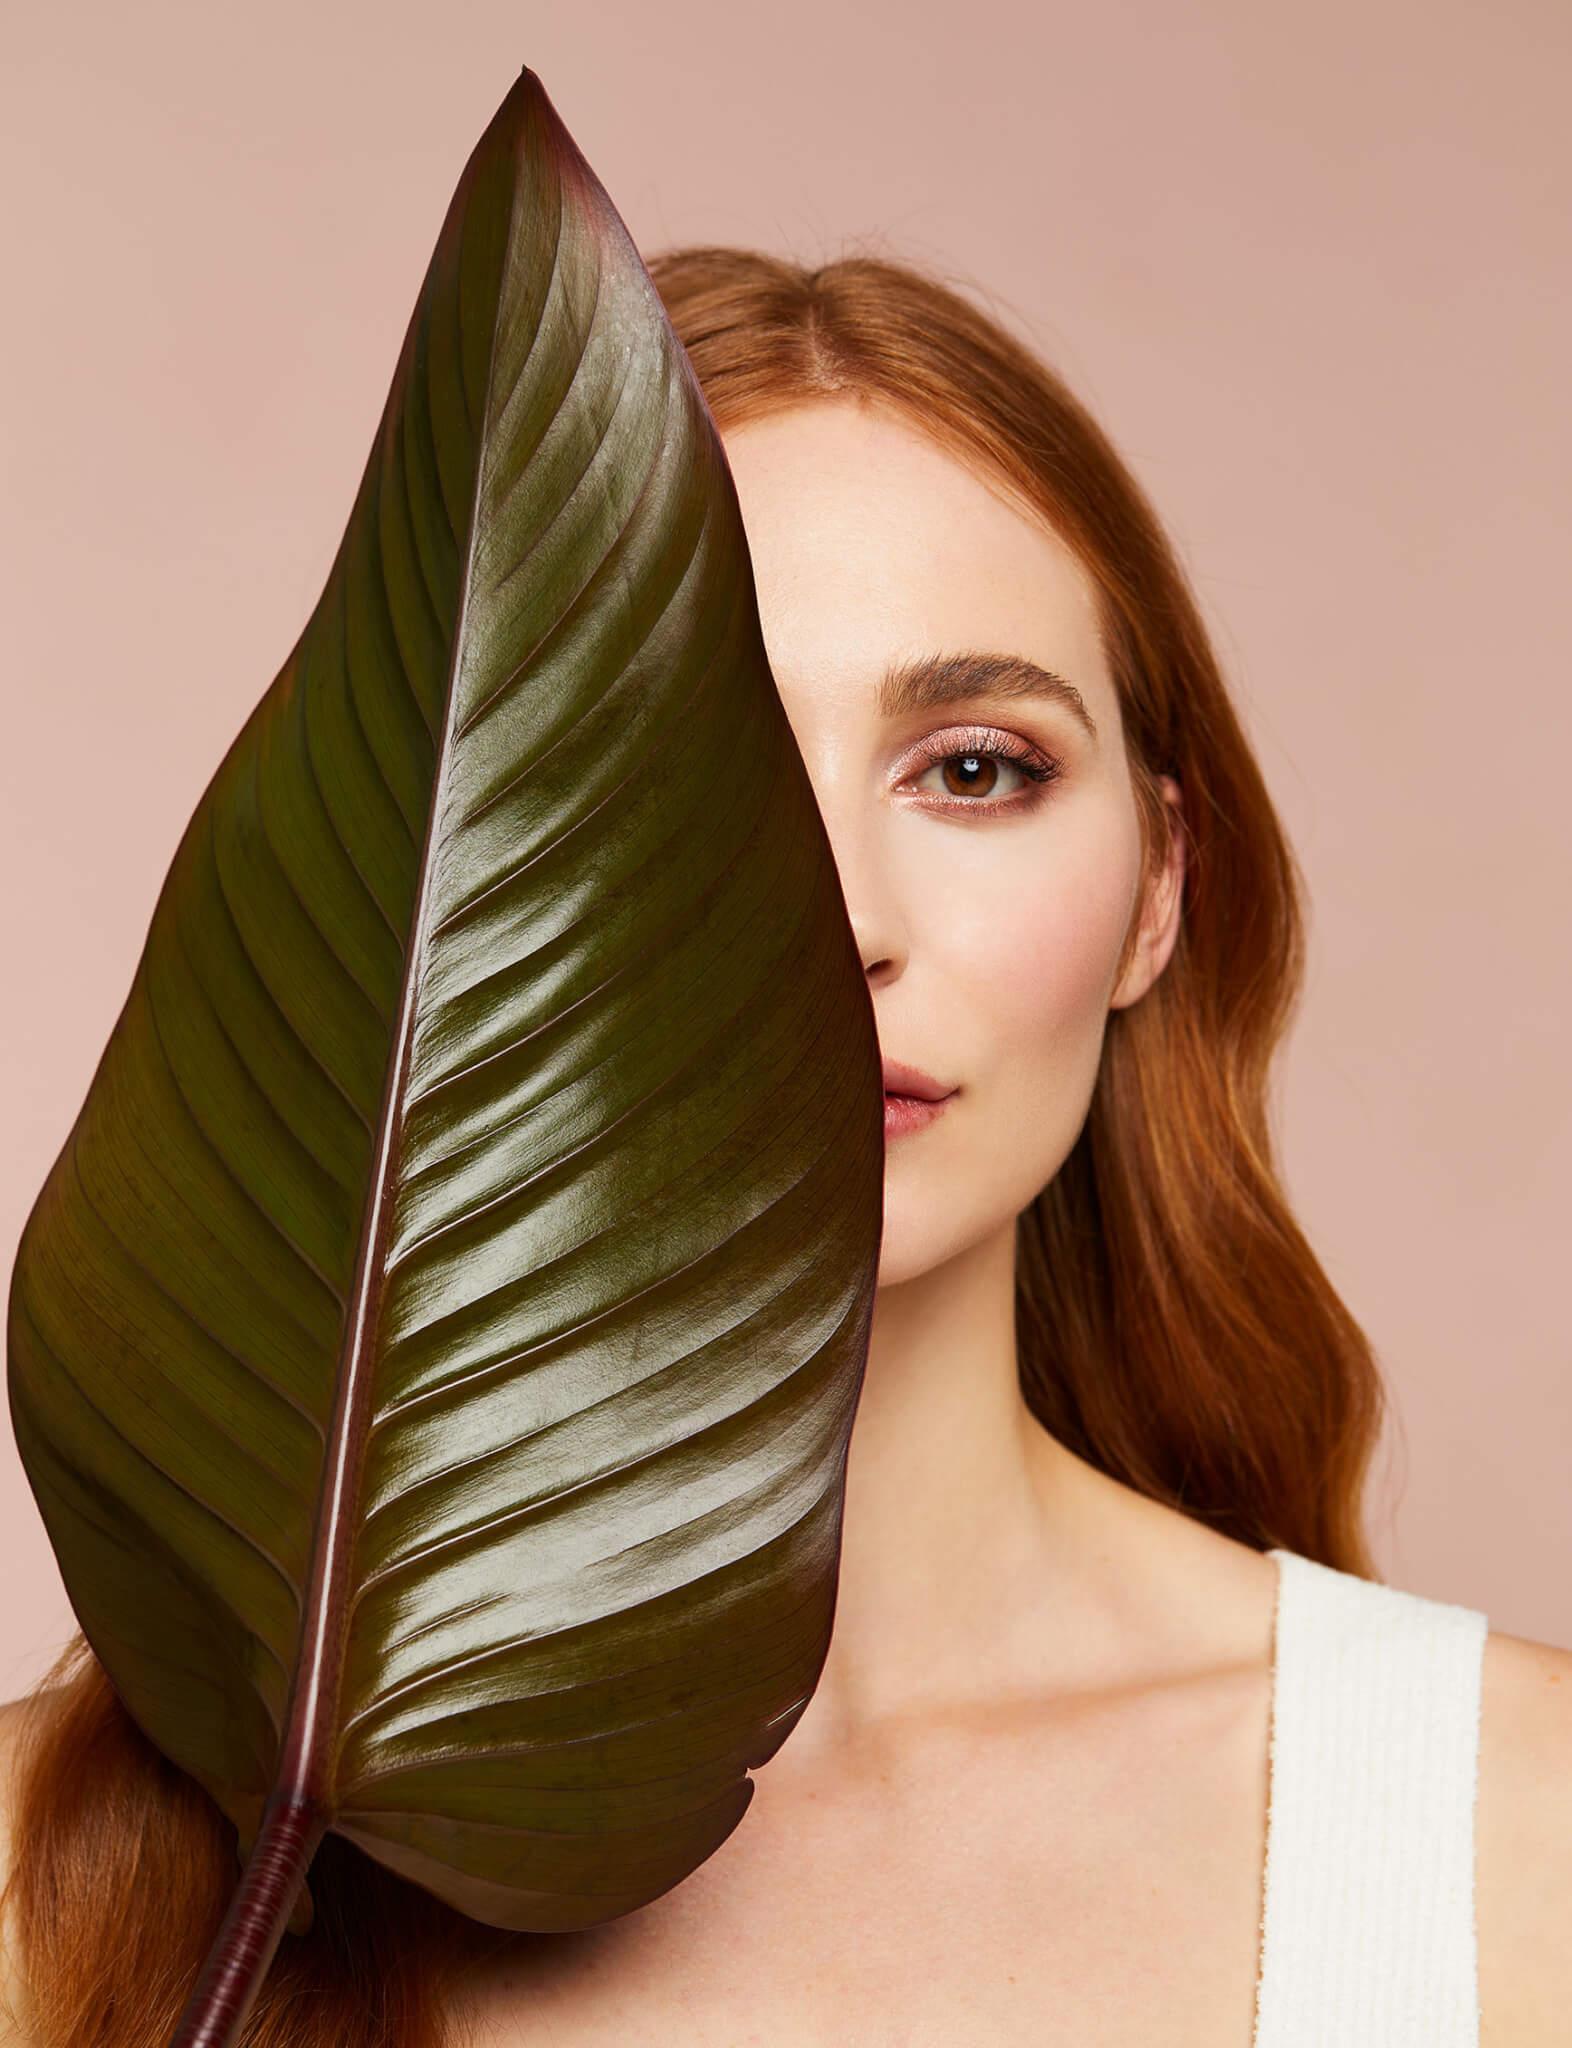 EARTH_leaf_closeup_w